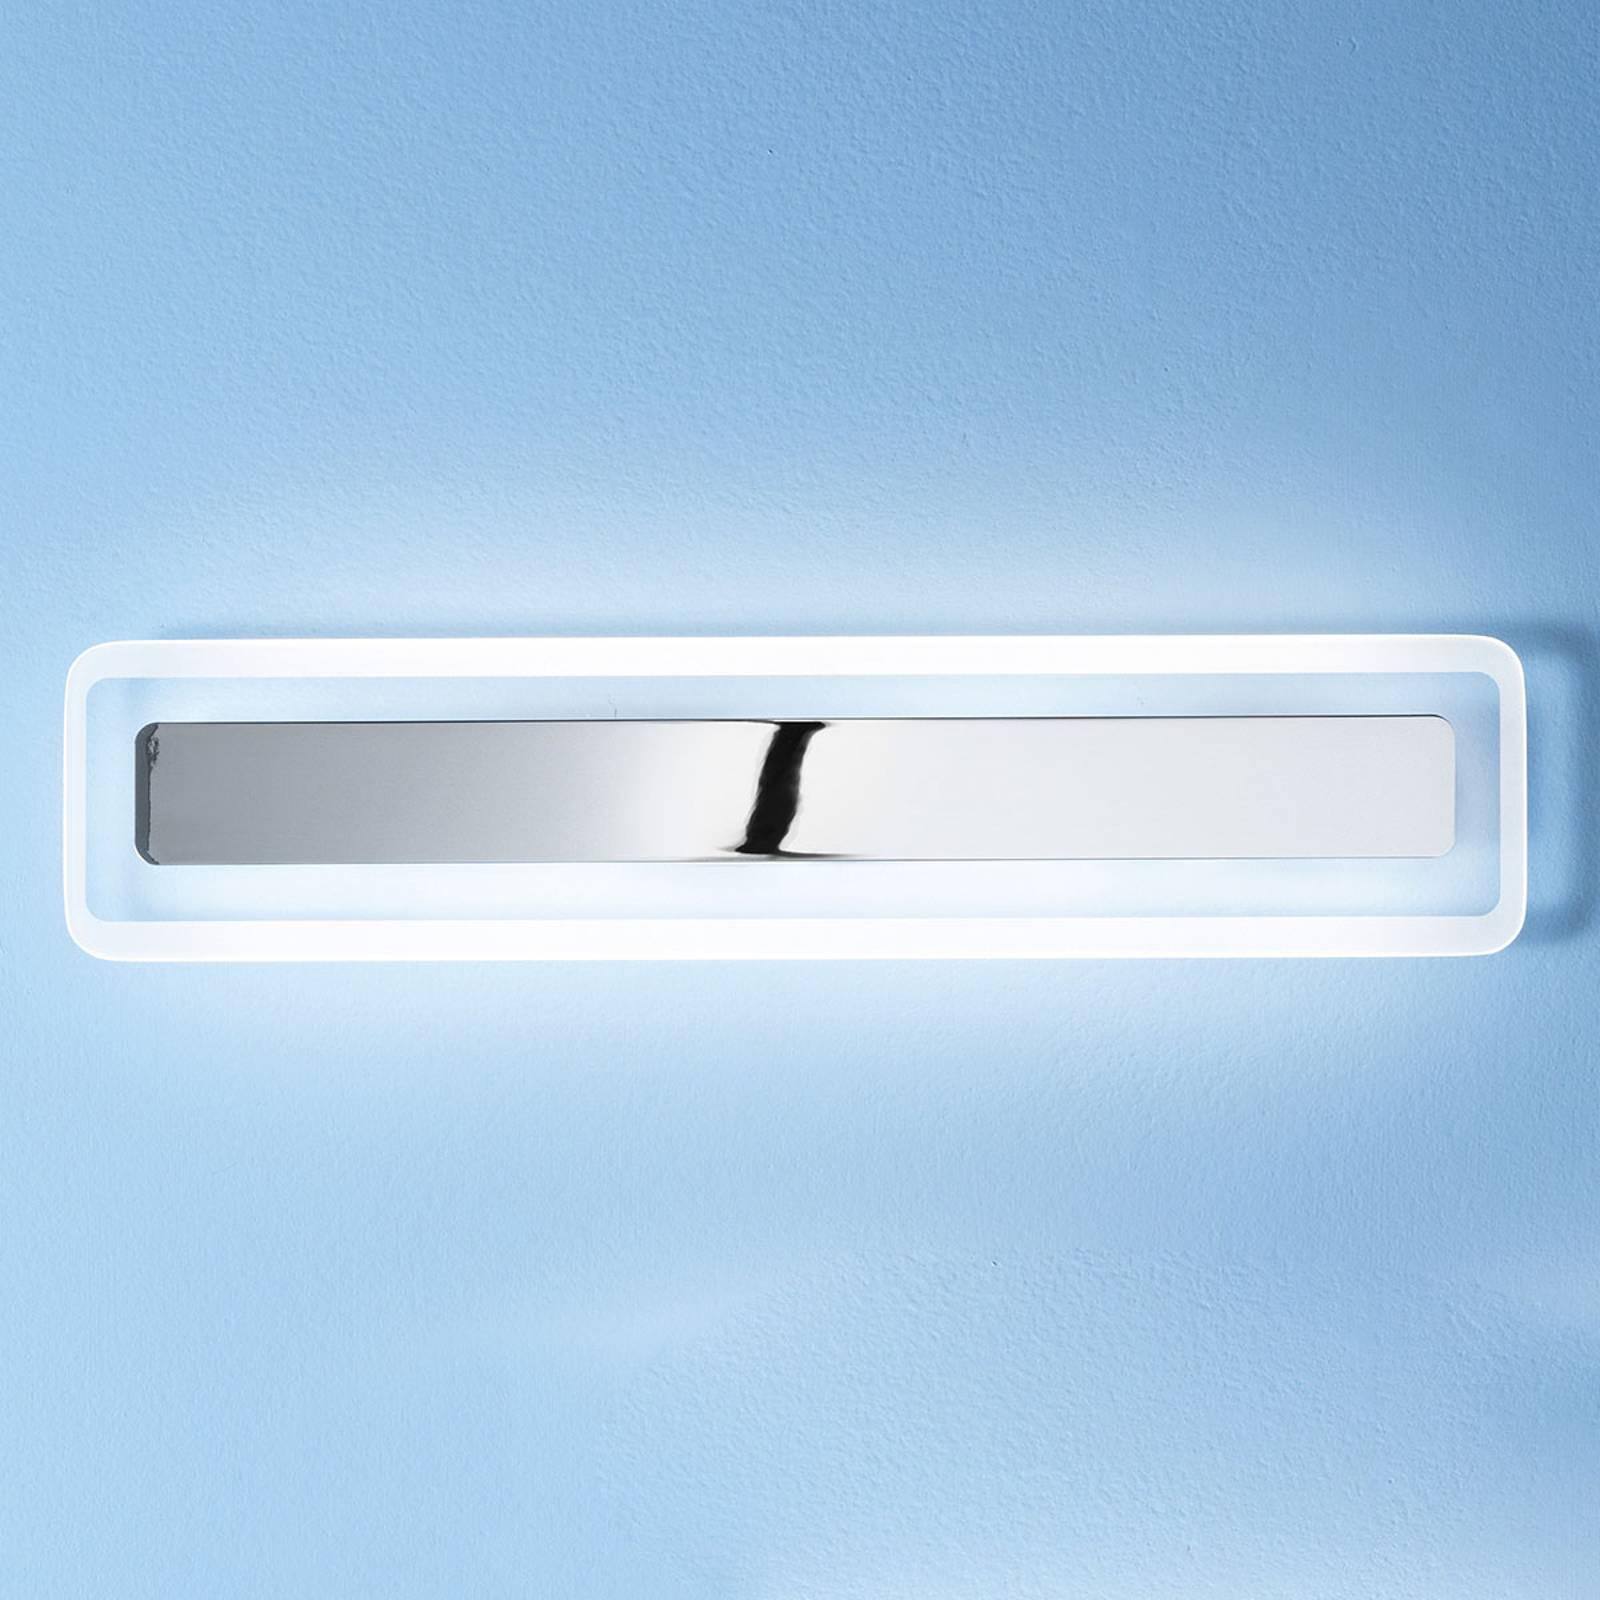 LED wandlamp Antille chroom 61,4 cm